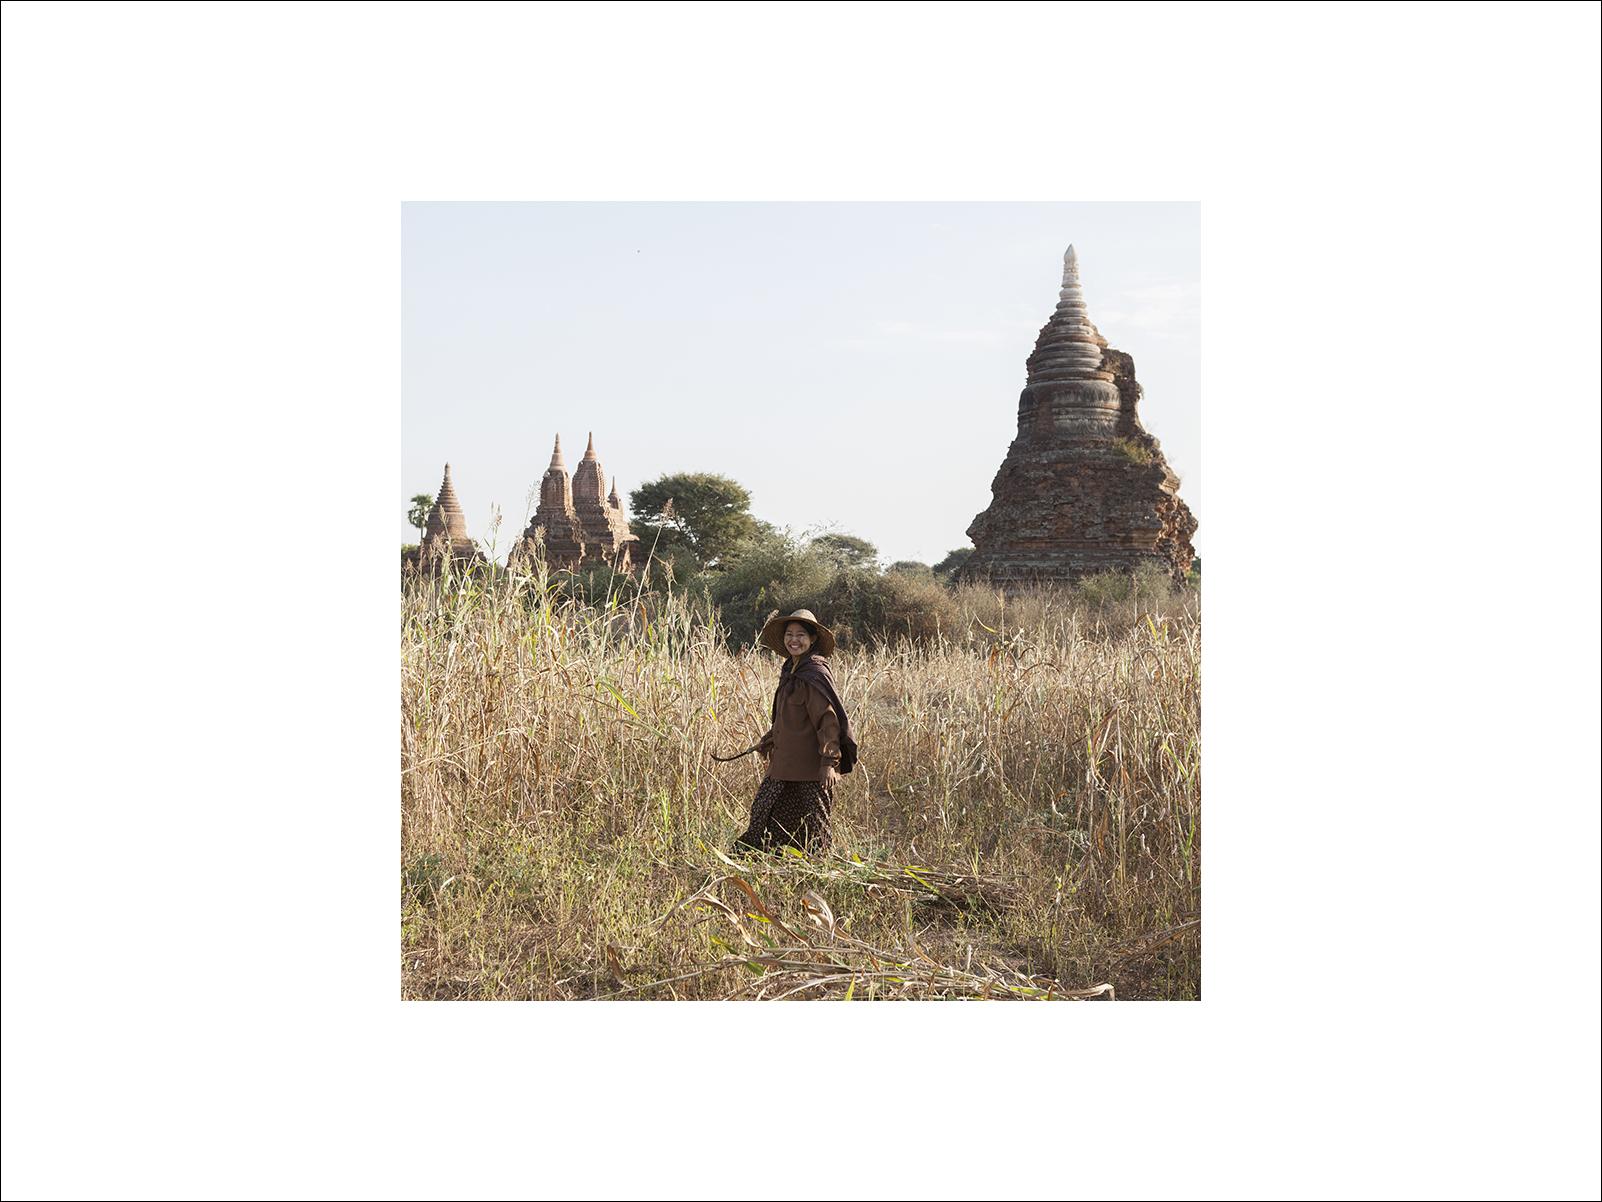 Burma Travel Story